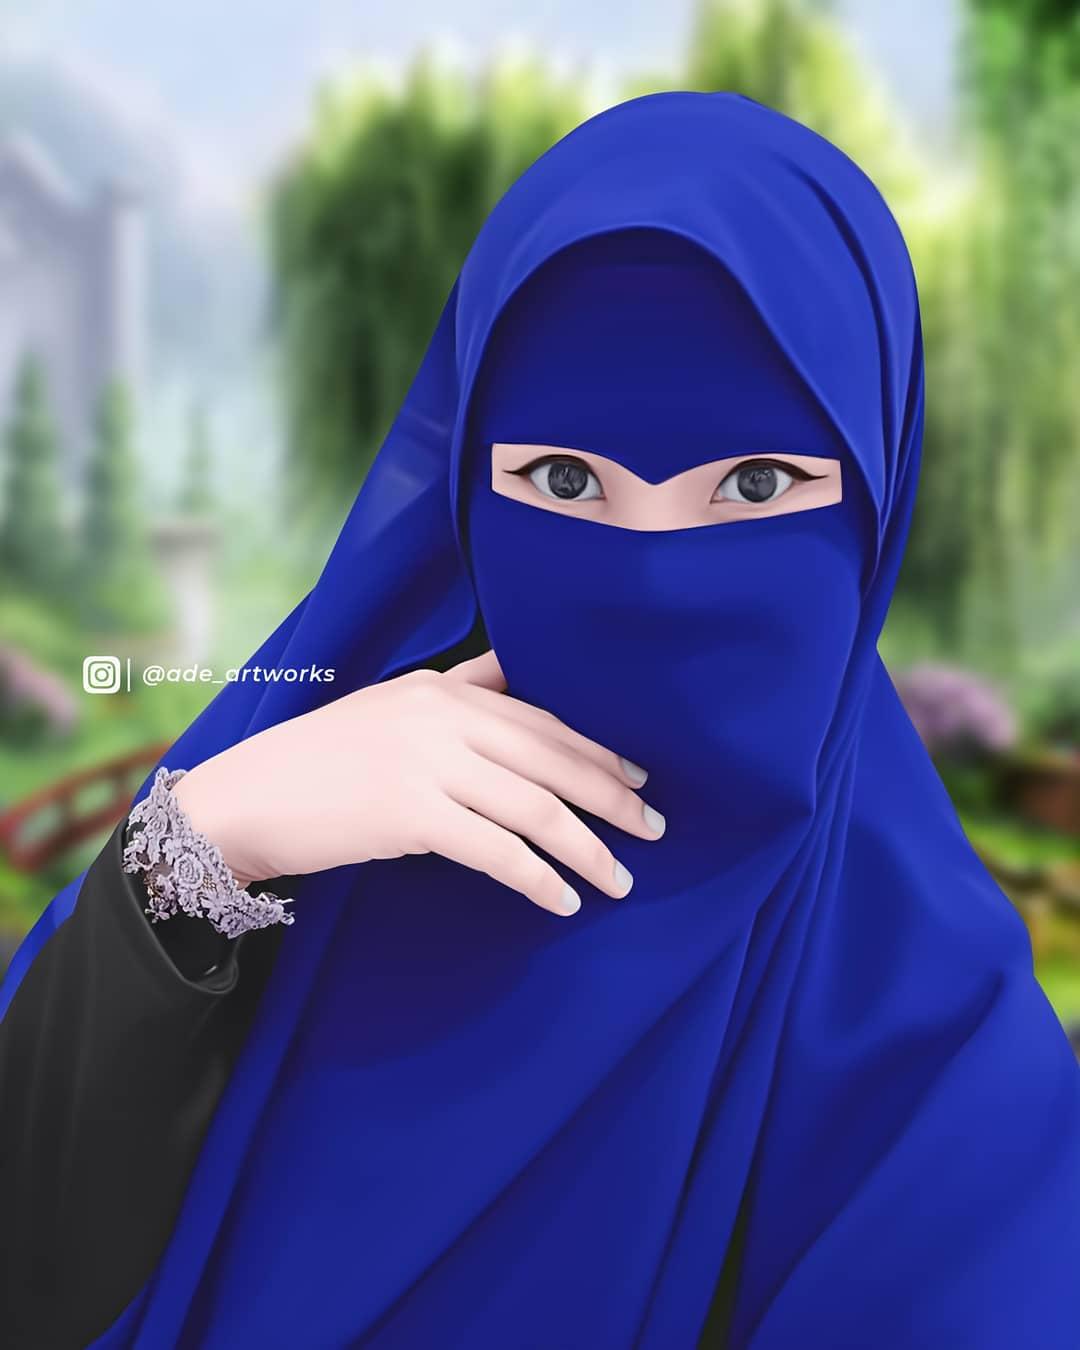 Gambar Kartun Muslimah,Muslimah Cadar,Kartun Muslimah,gambar kartun muslimah,islamic pattern vector,islamic background vector,download vector islamic mosque free,islamic vector png,cartoon muslimah